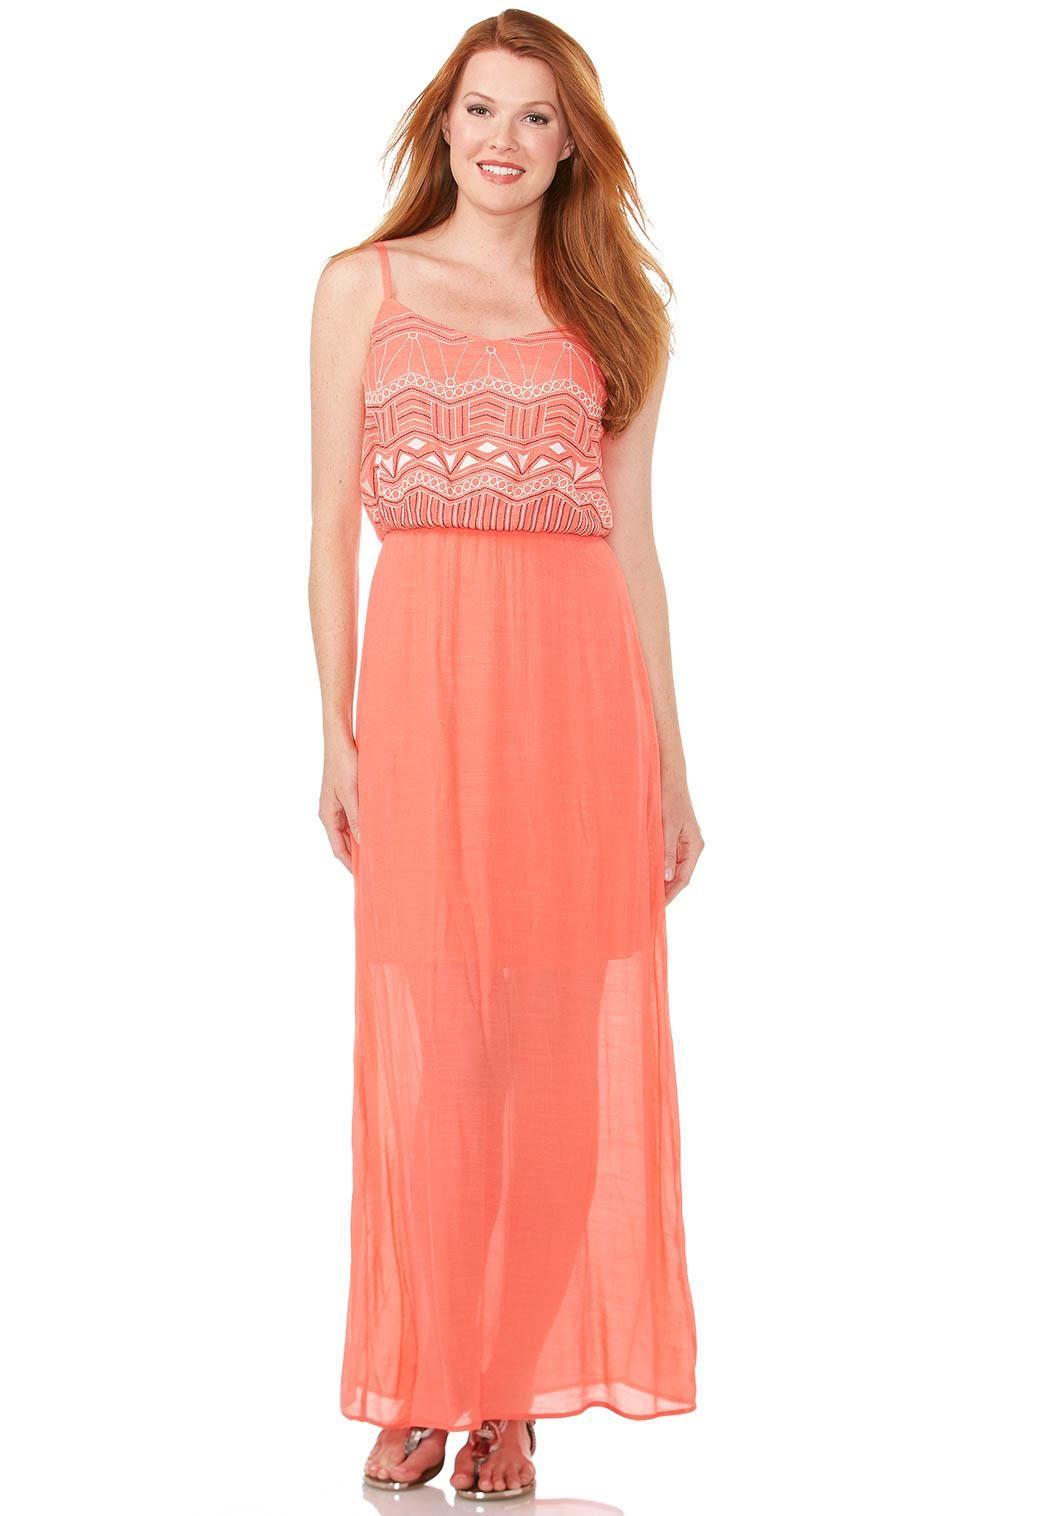 blouson boho maxi dress dresses cato fashions | cool & casual